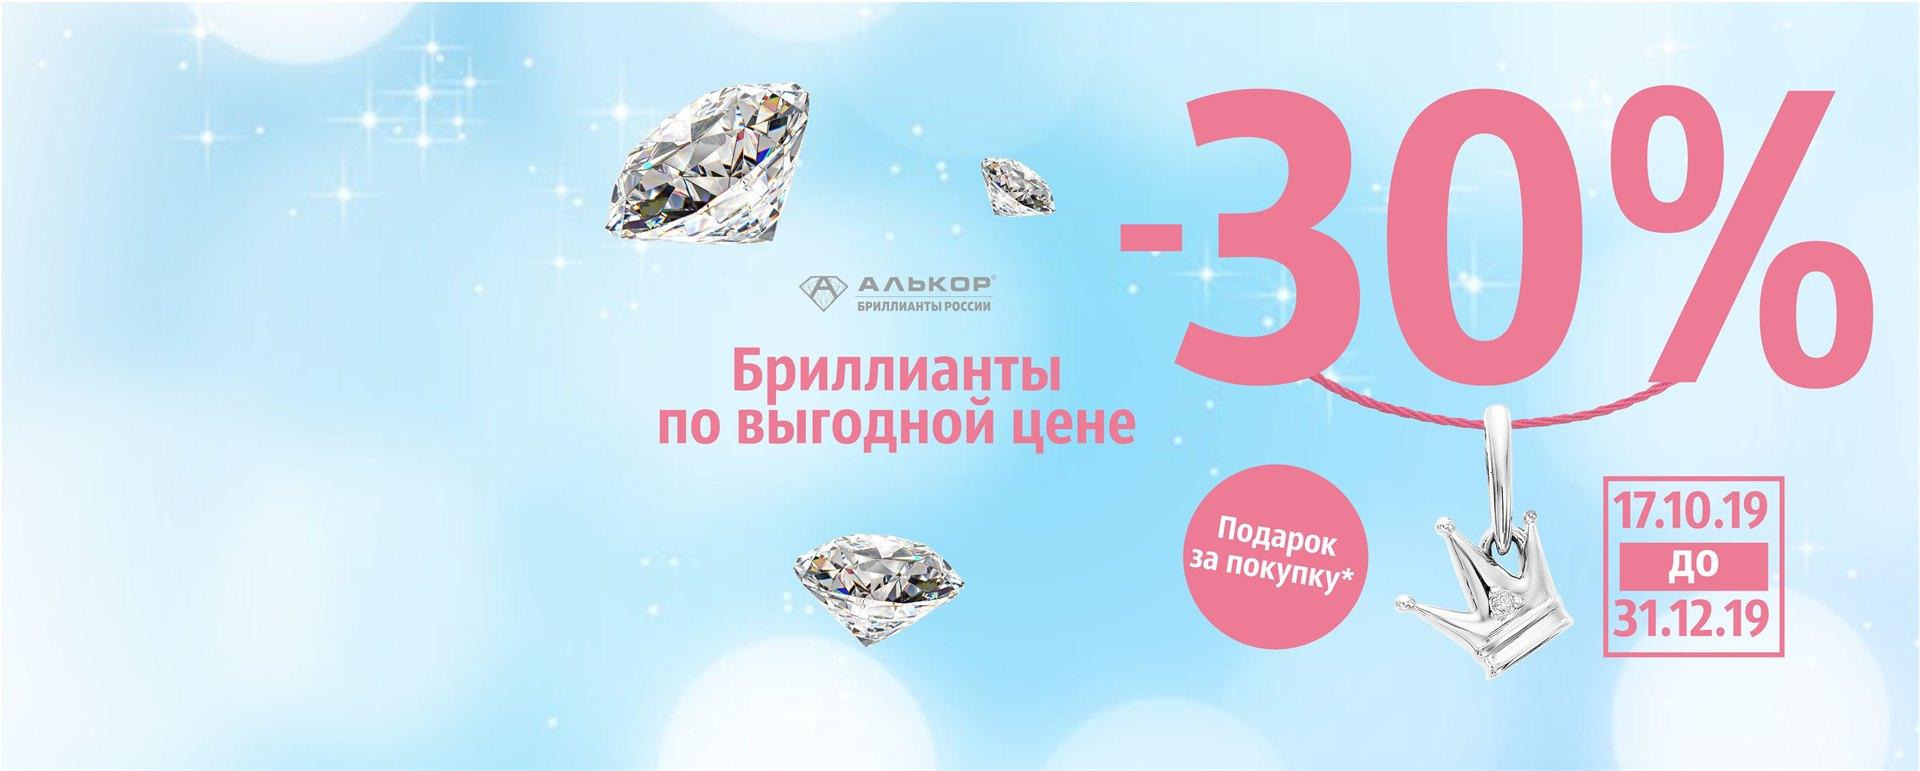 https://www.almazcom.ru/pub/img/Info/24/Banner_na_glavnuyu_alkor_31.12.jpg